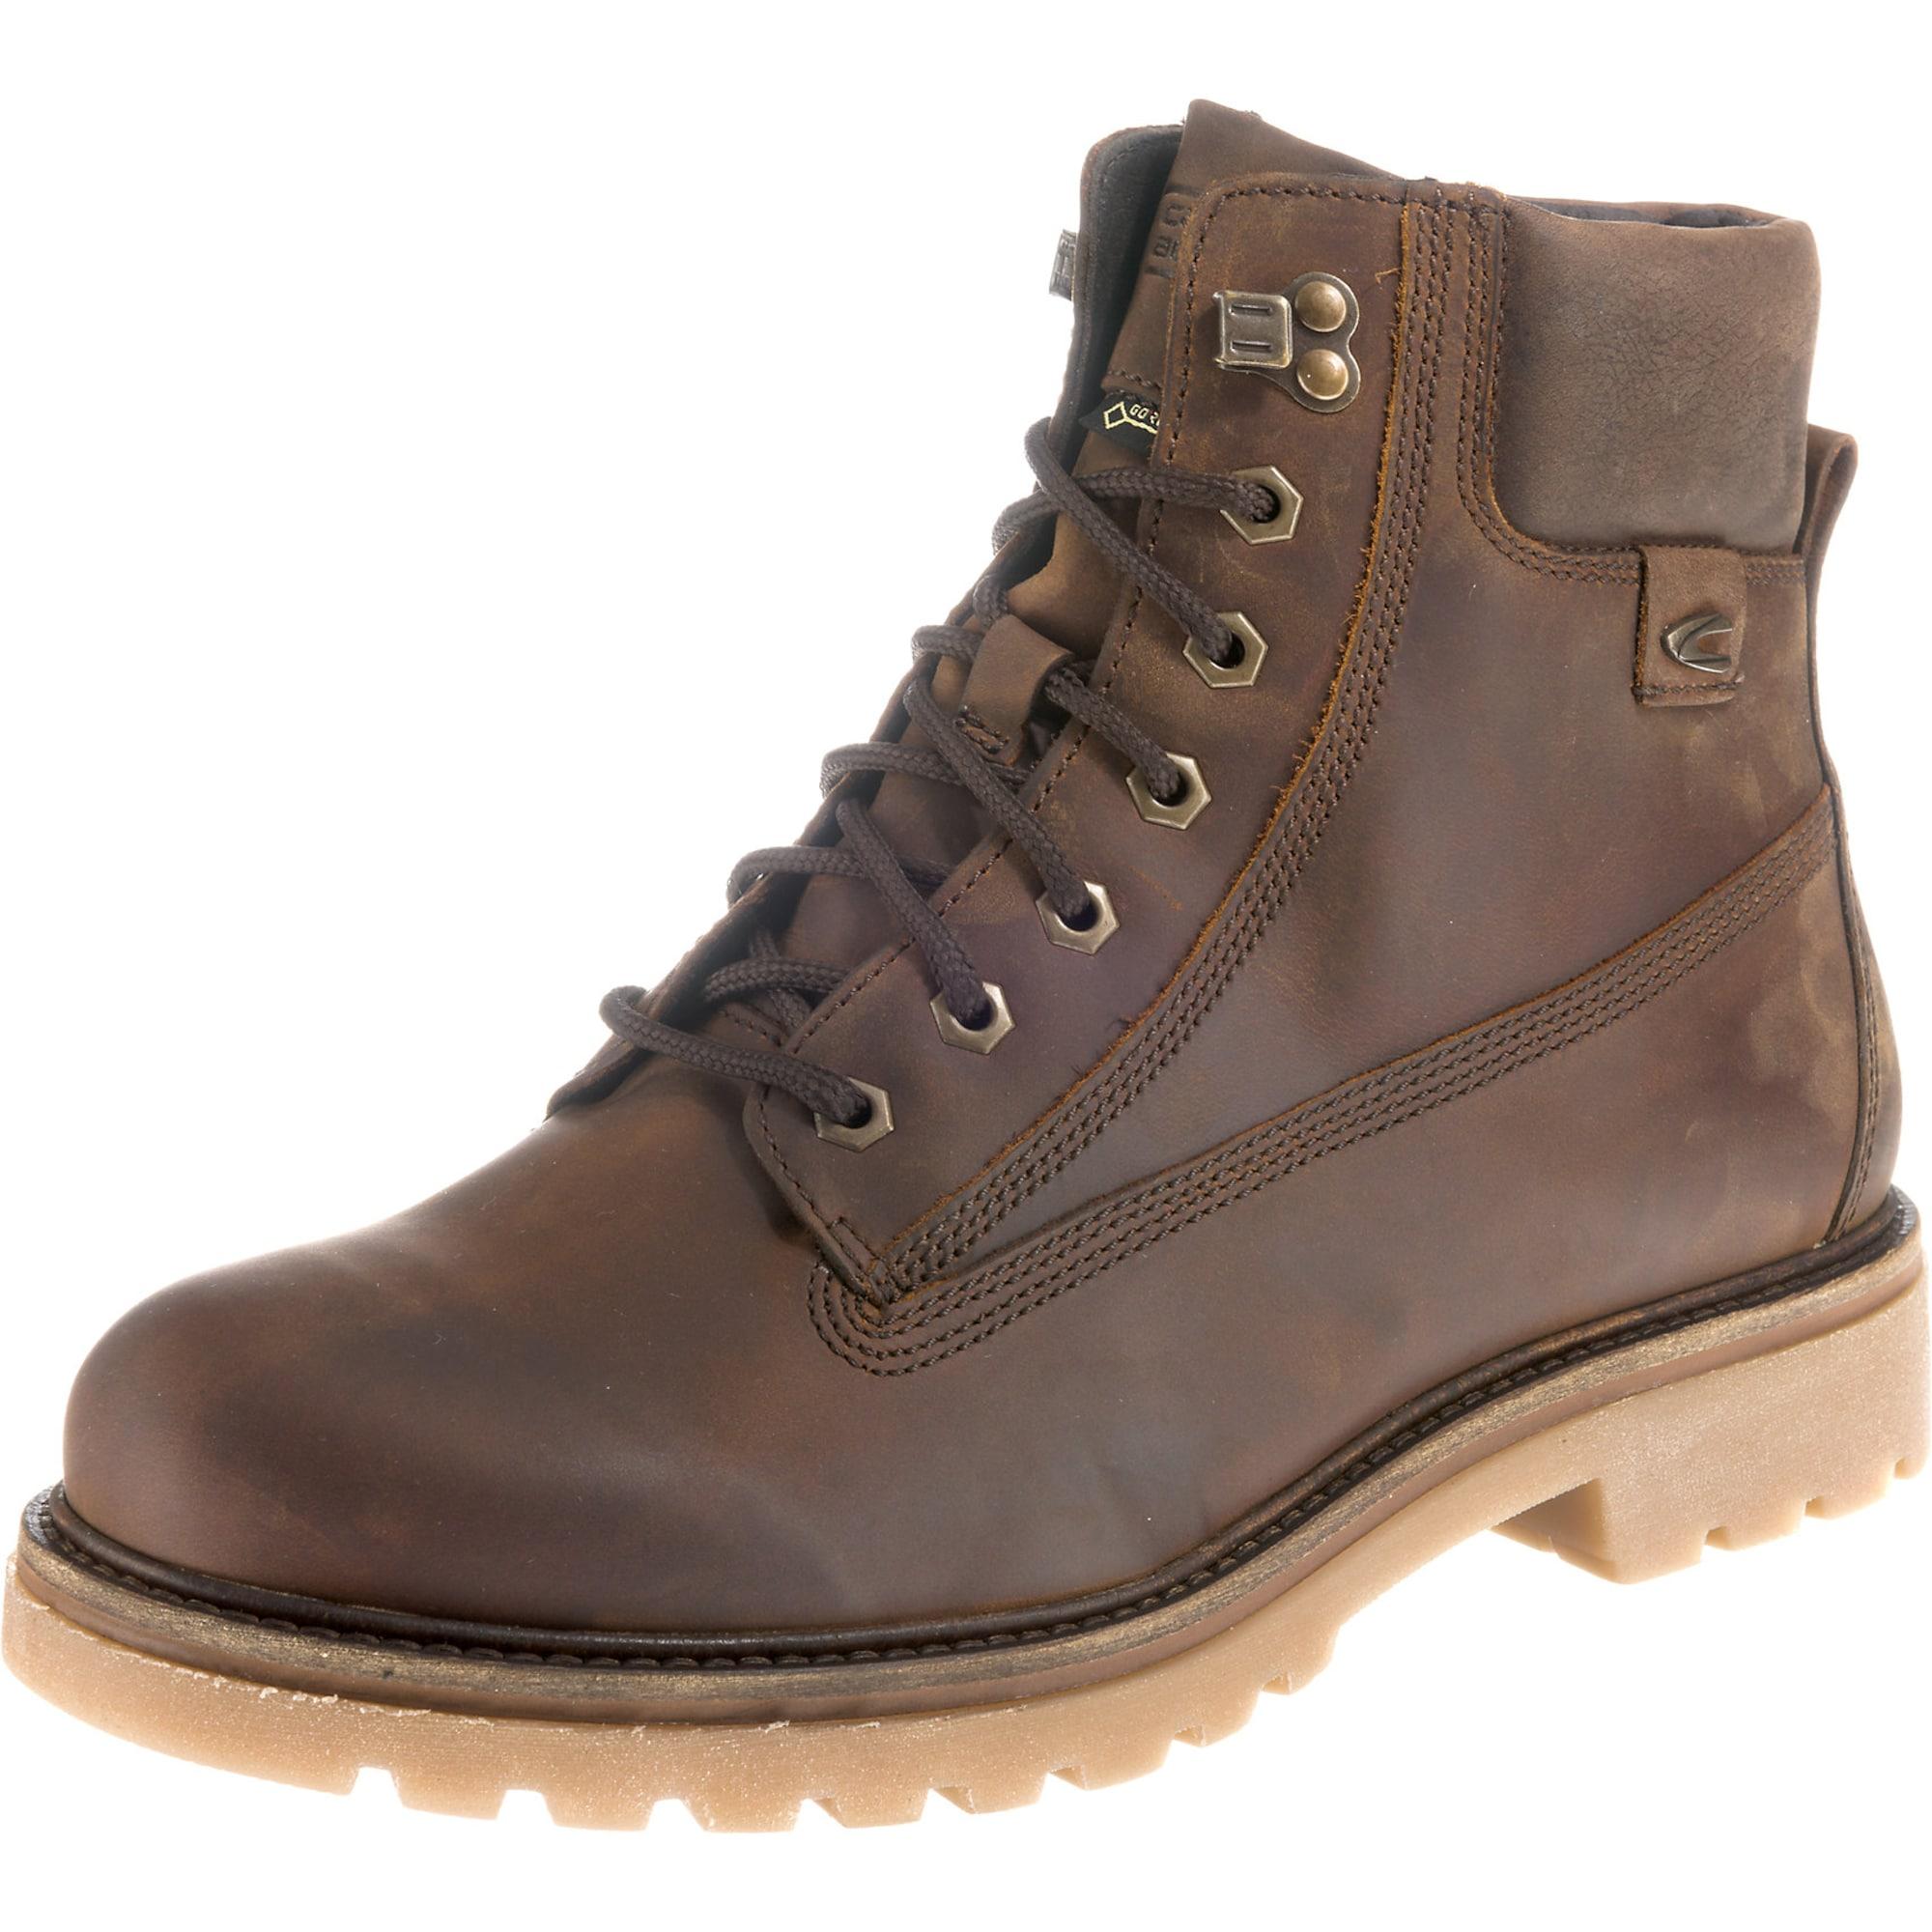 Winterstiefel 'Canberra GTX 11' | Schuhe > Boots > Winterstiefel | Mokka | camel active